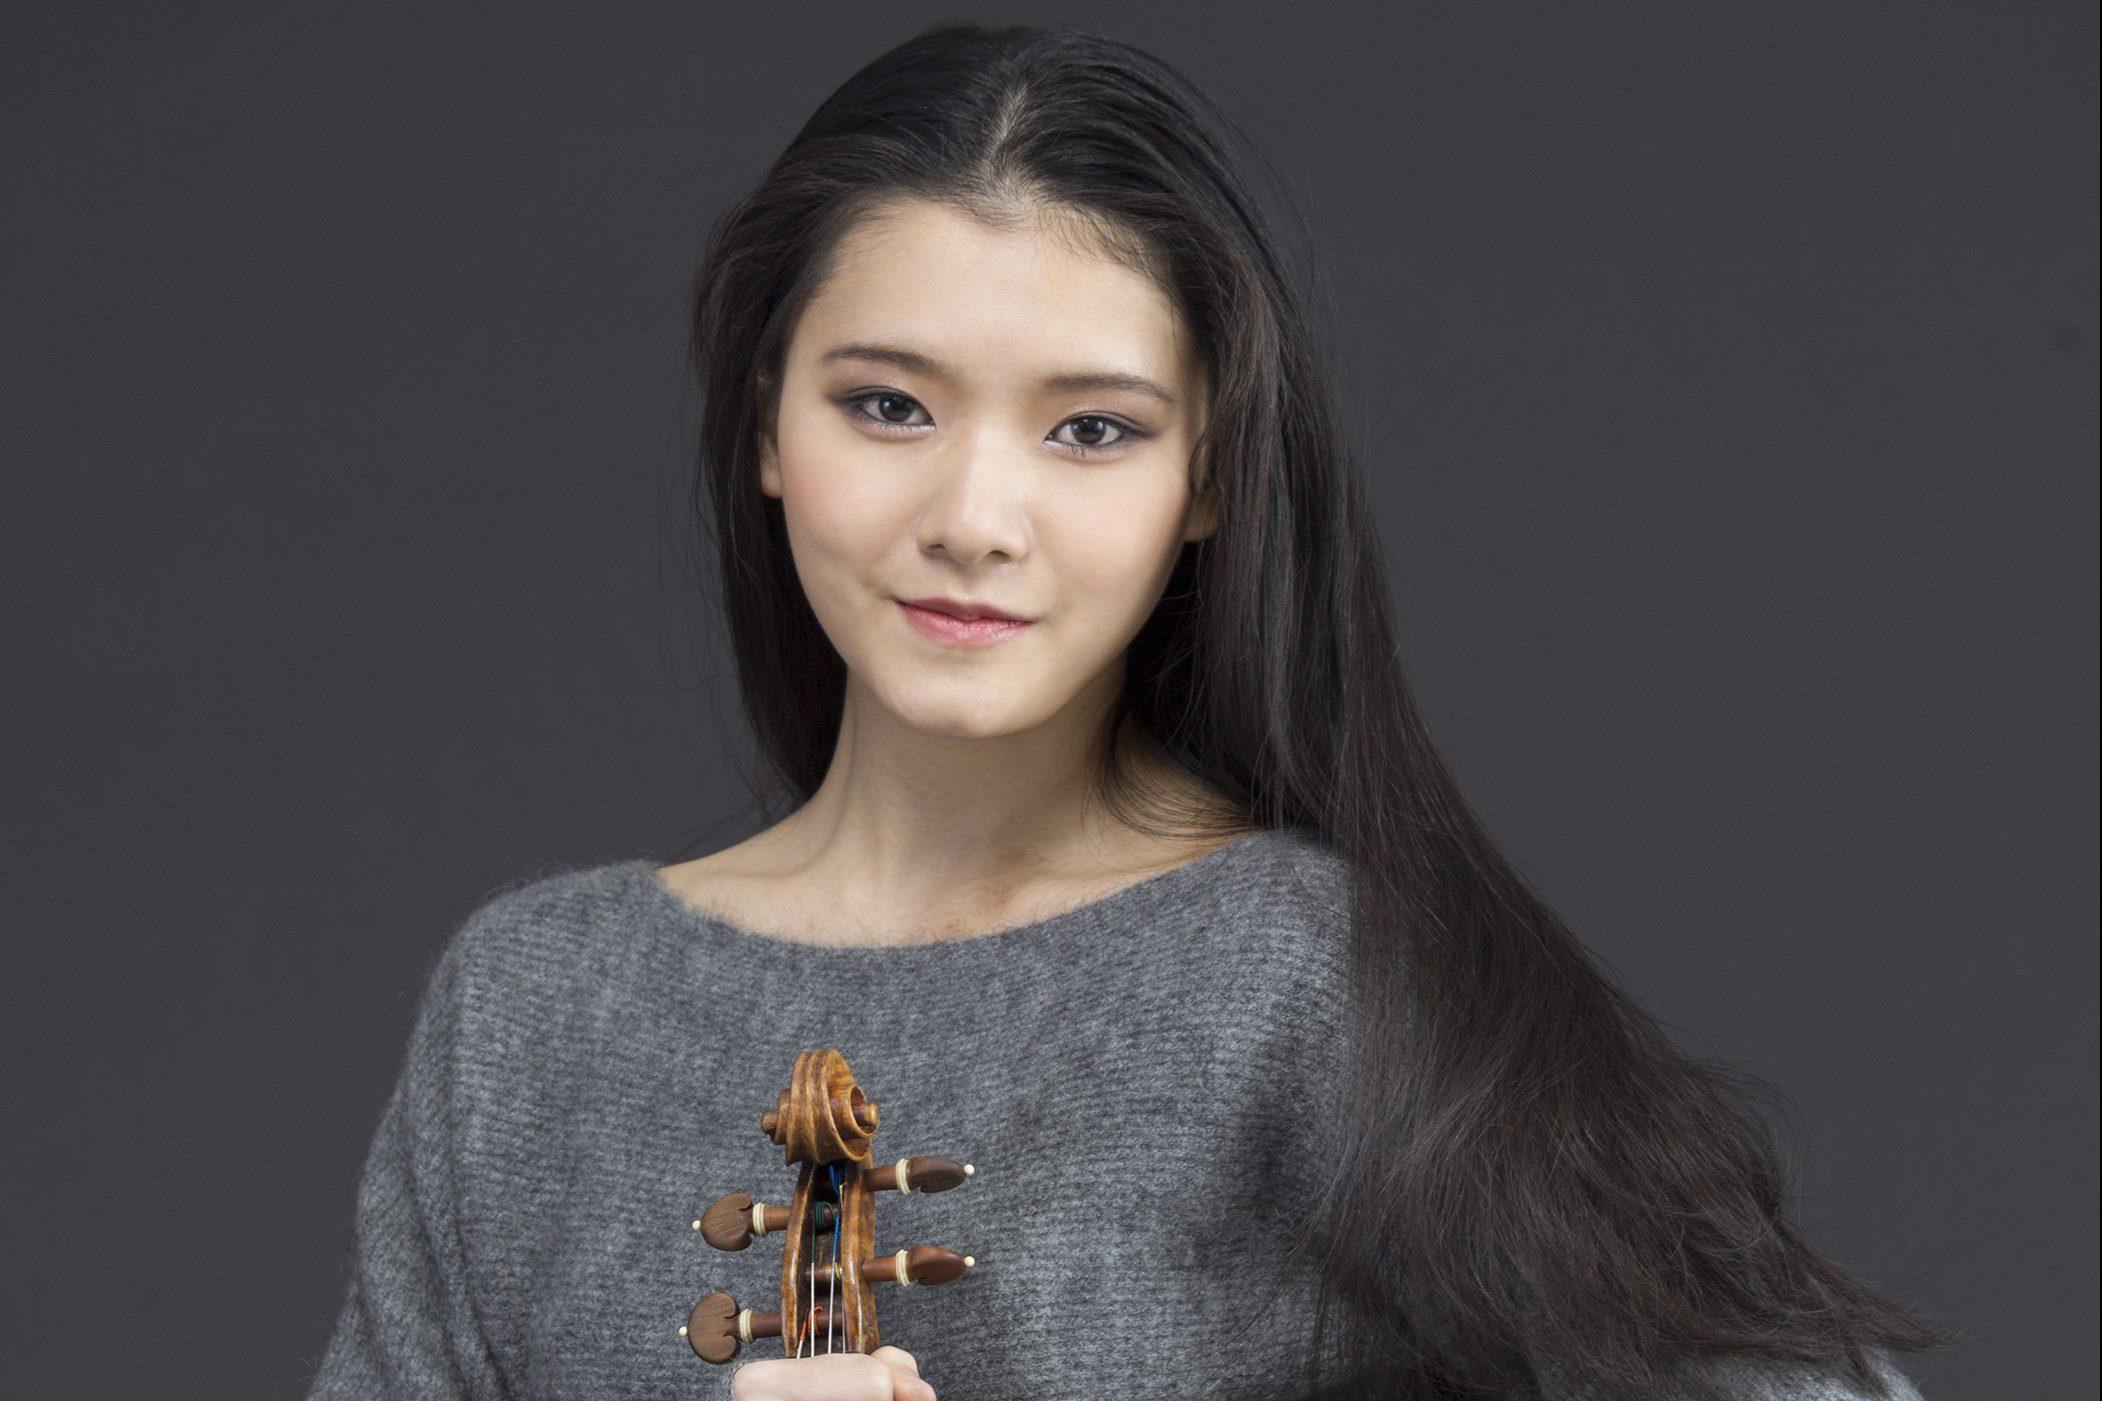 Moné Hattori performs with Yutaka Sado, live on television 3